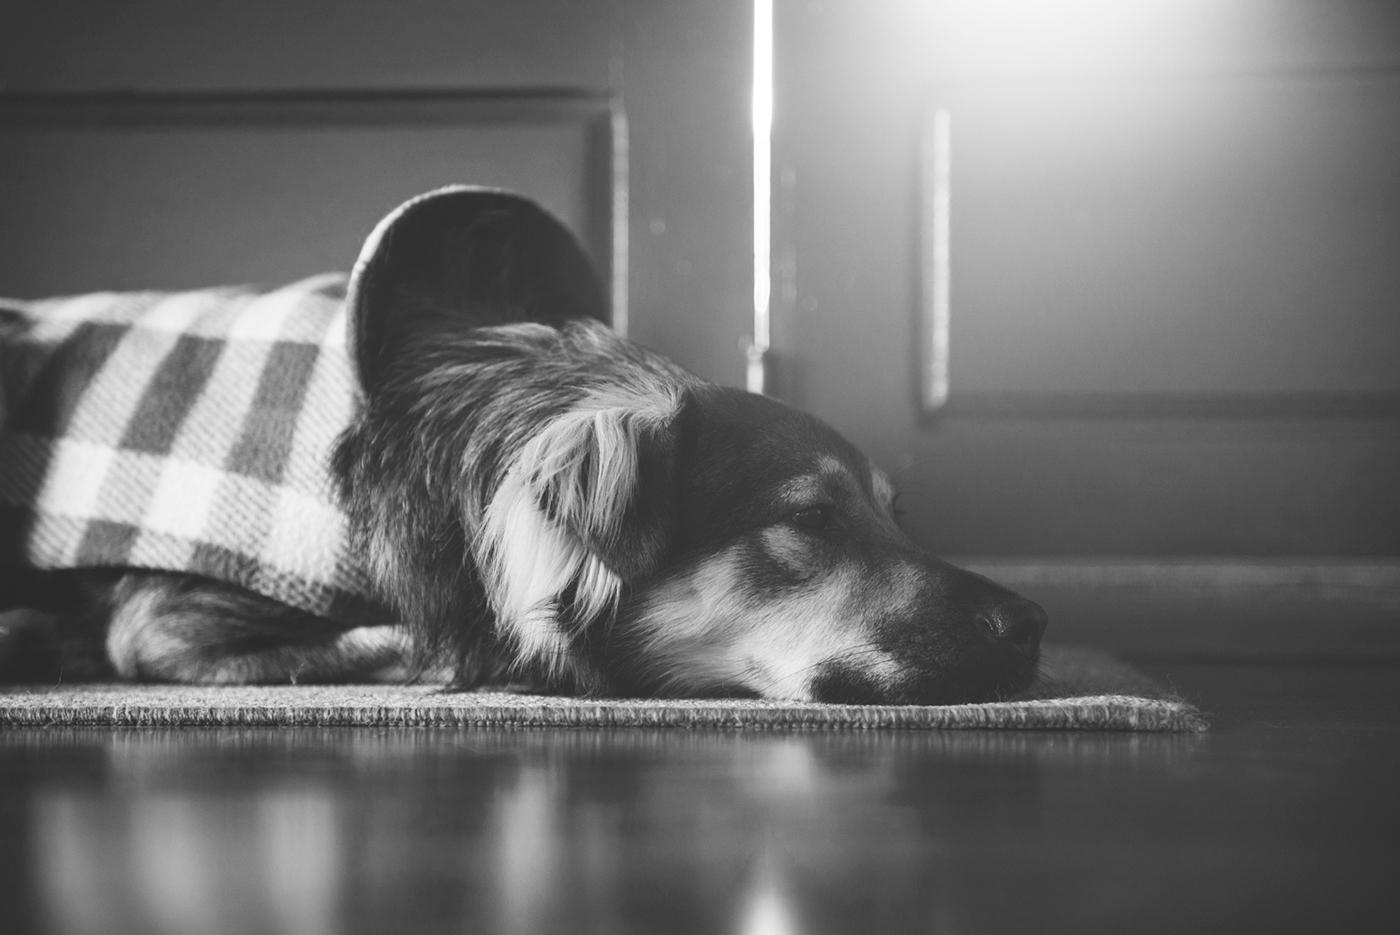 pet photography dogs Mutts fotografia de estimação